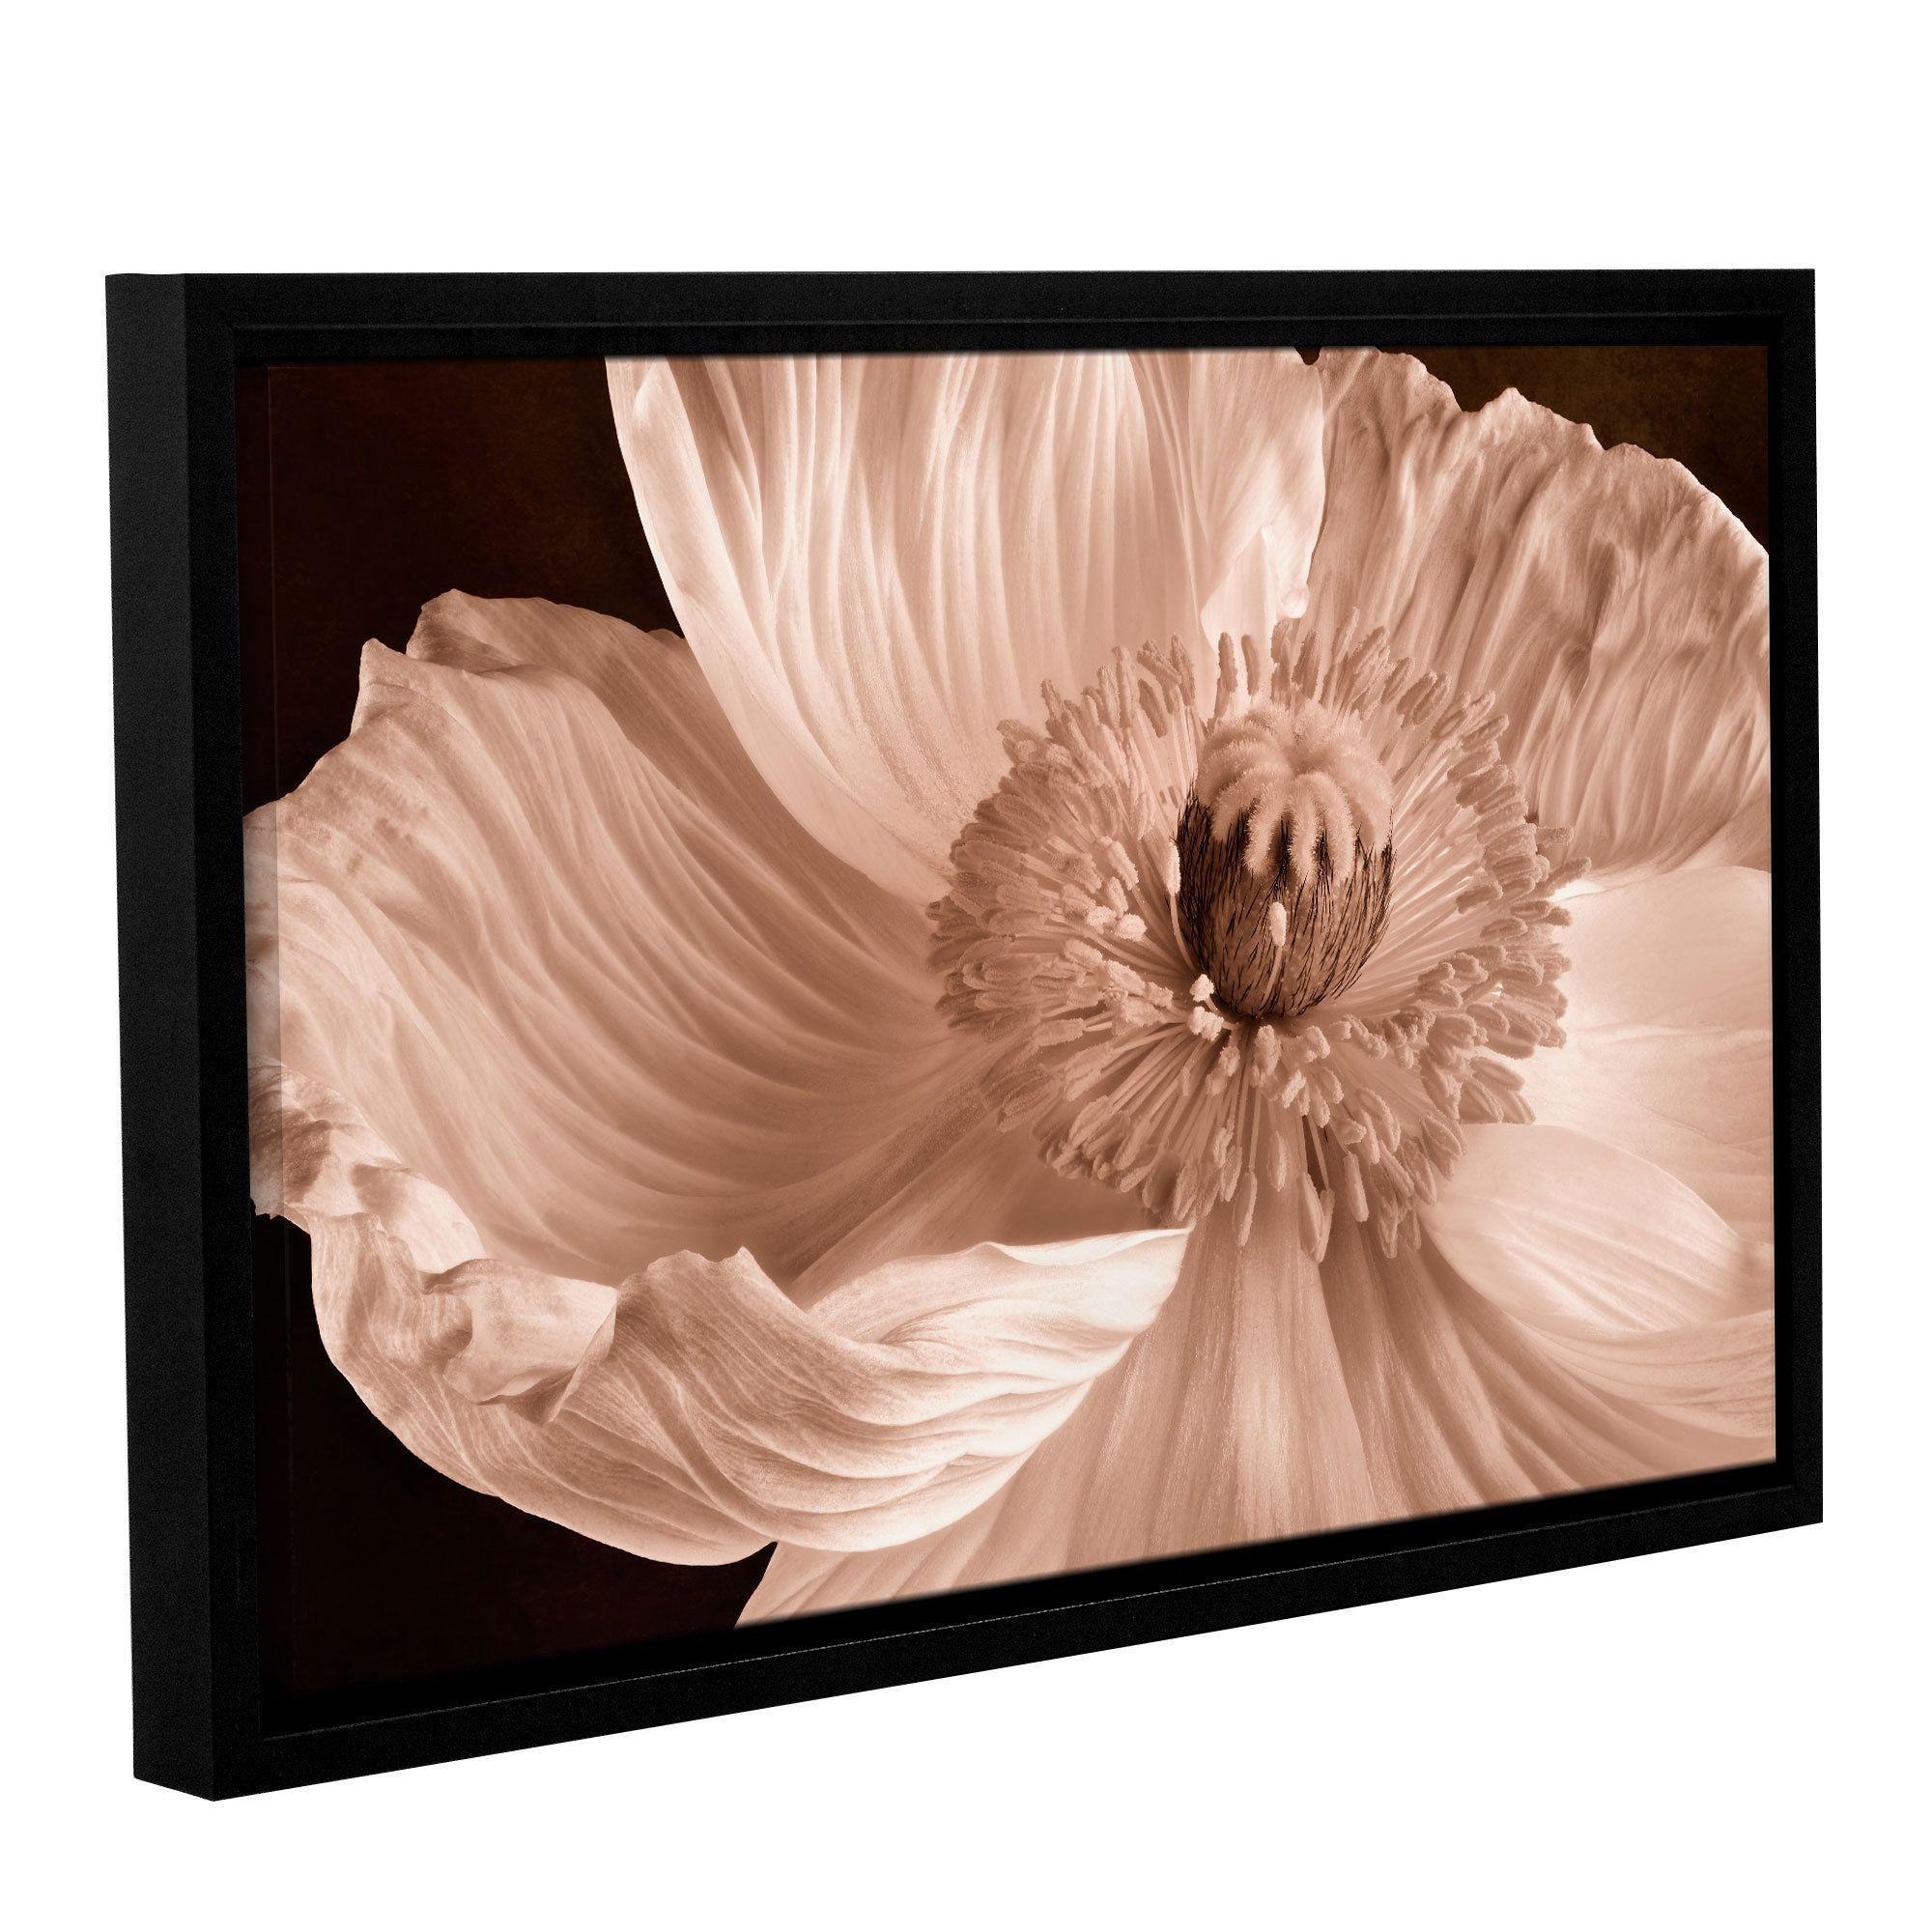 ArtWall Cora Niele's Poppy Gallery Wrapped Floater-framed